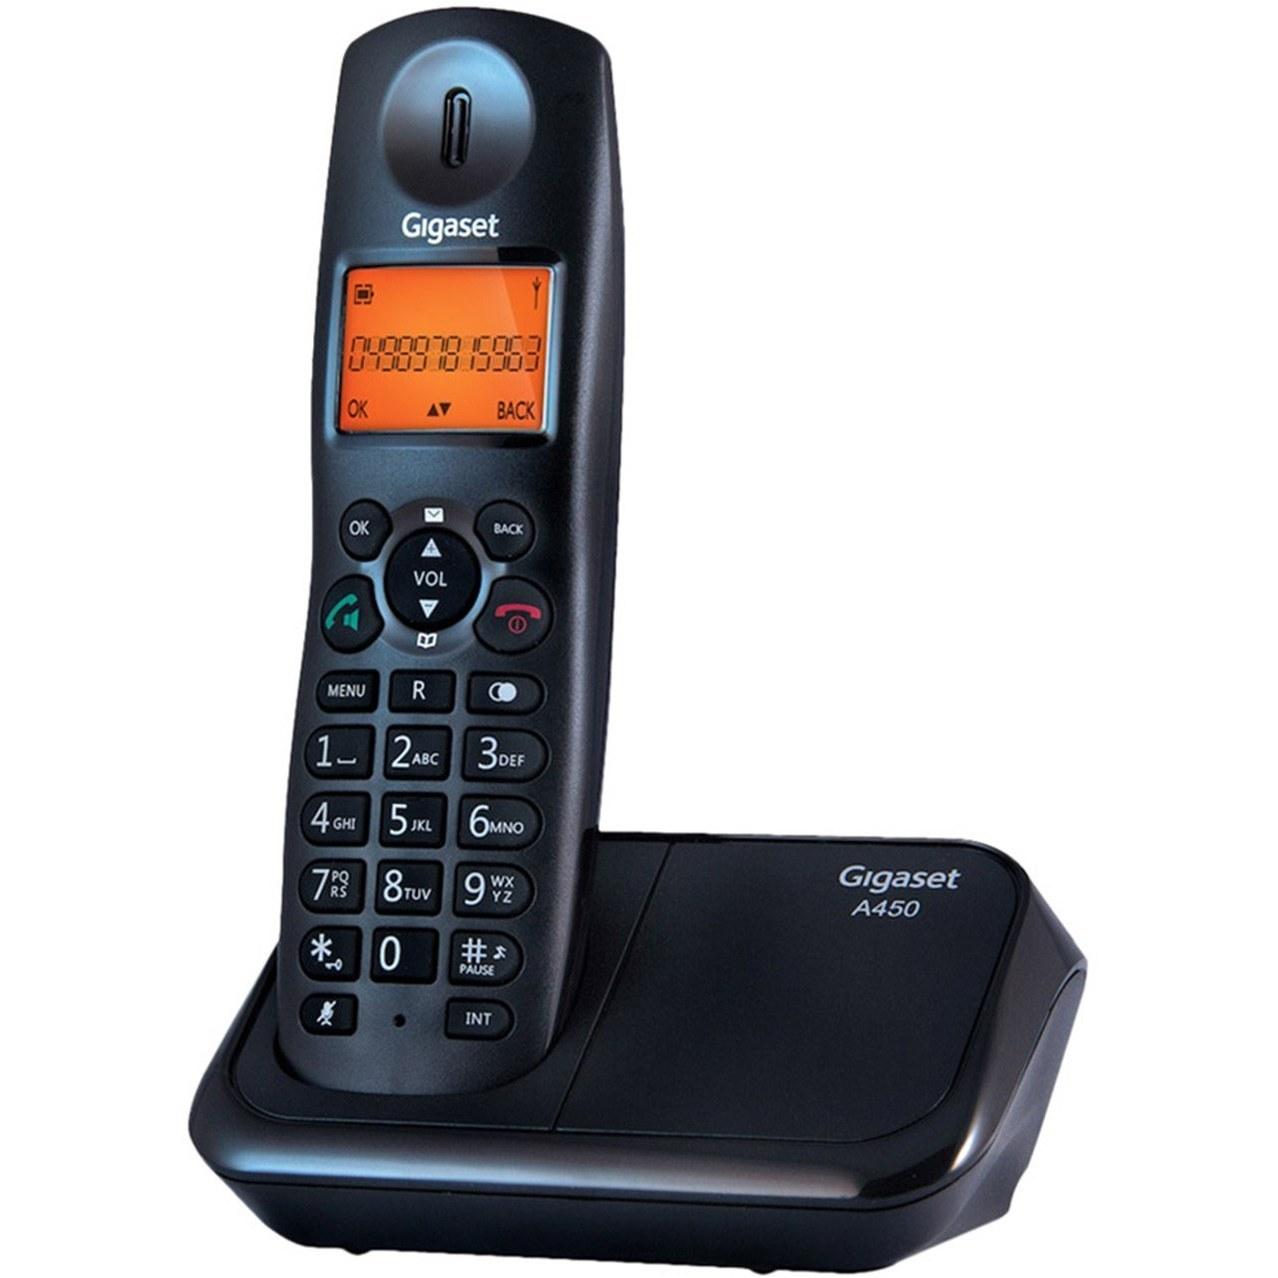 تصویر تلفن بی سیم گیگاست مدل A450 Gigaset A450 Wireless Phone